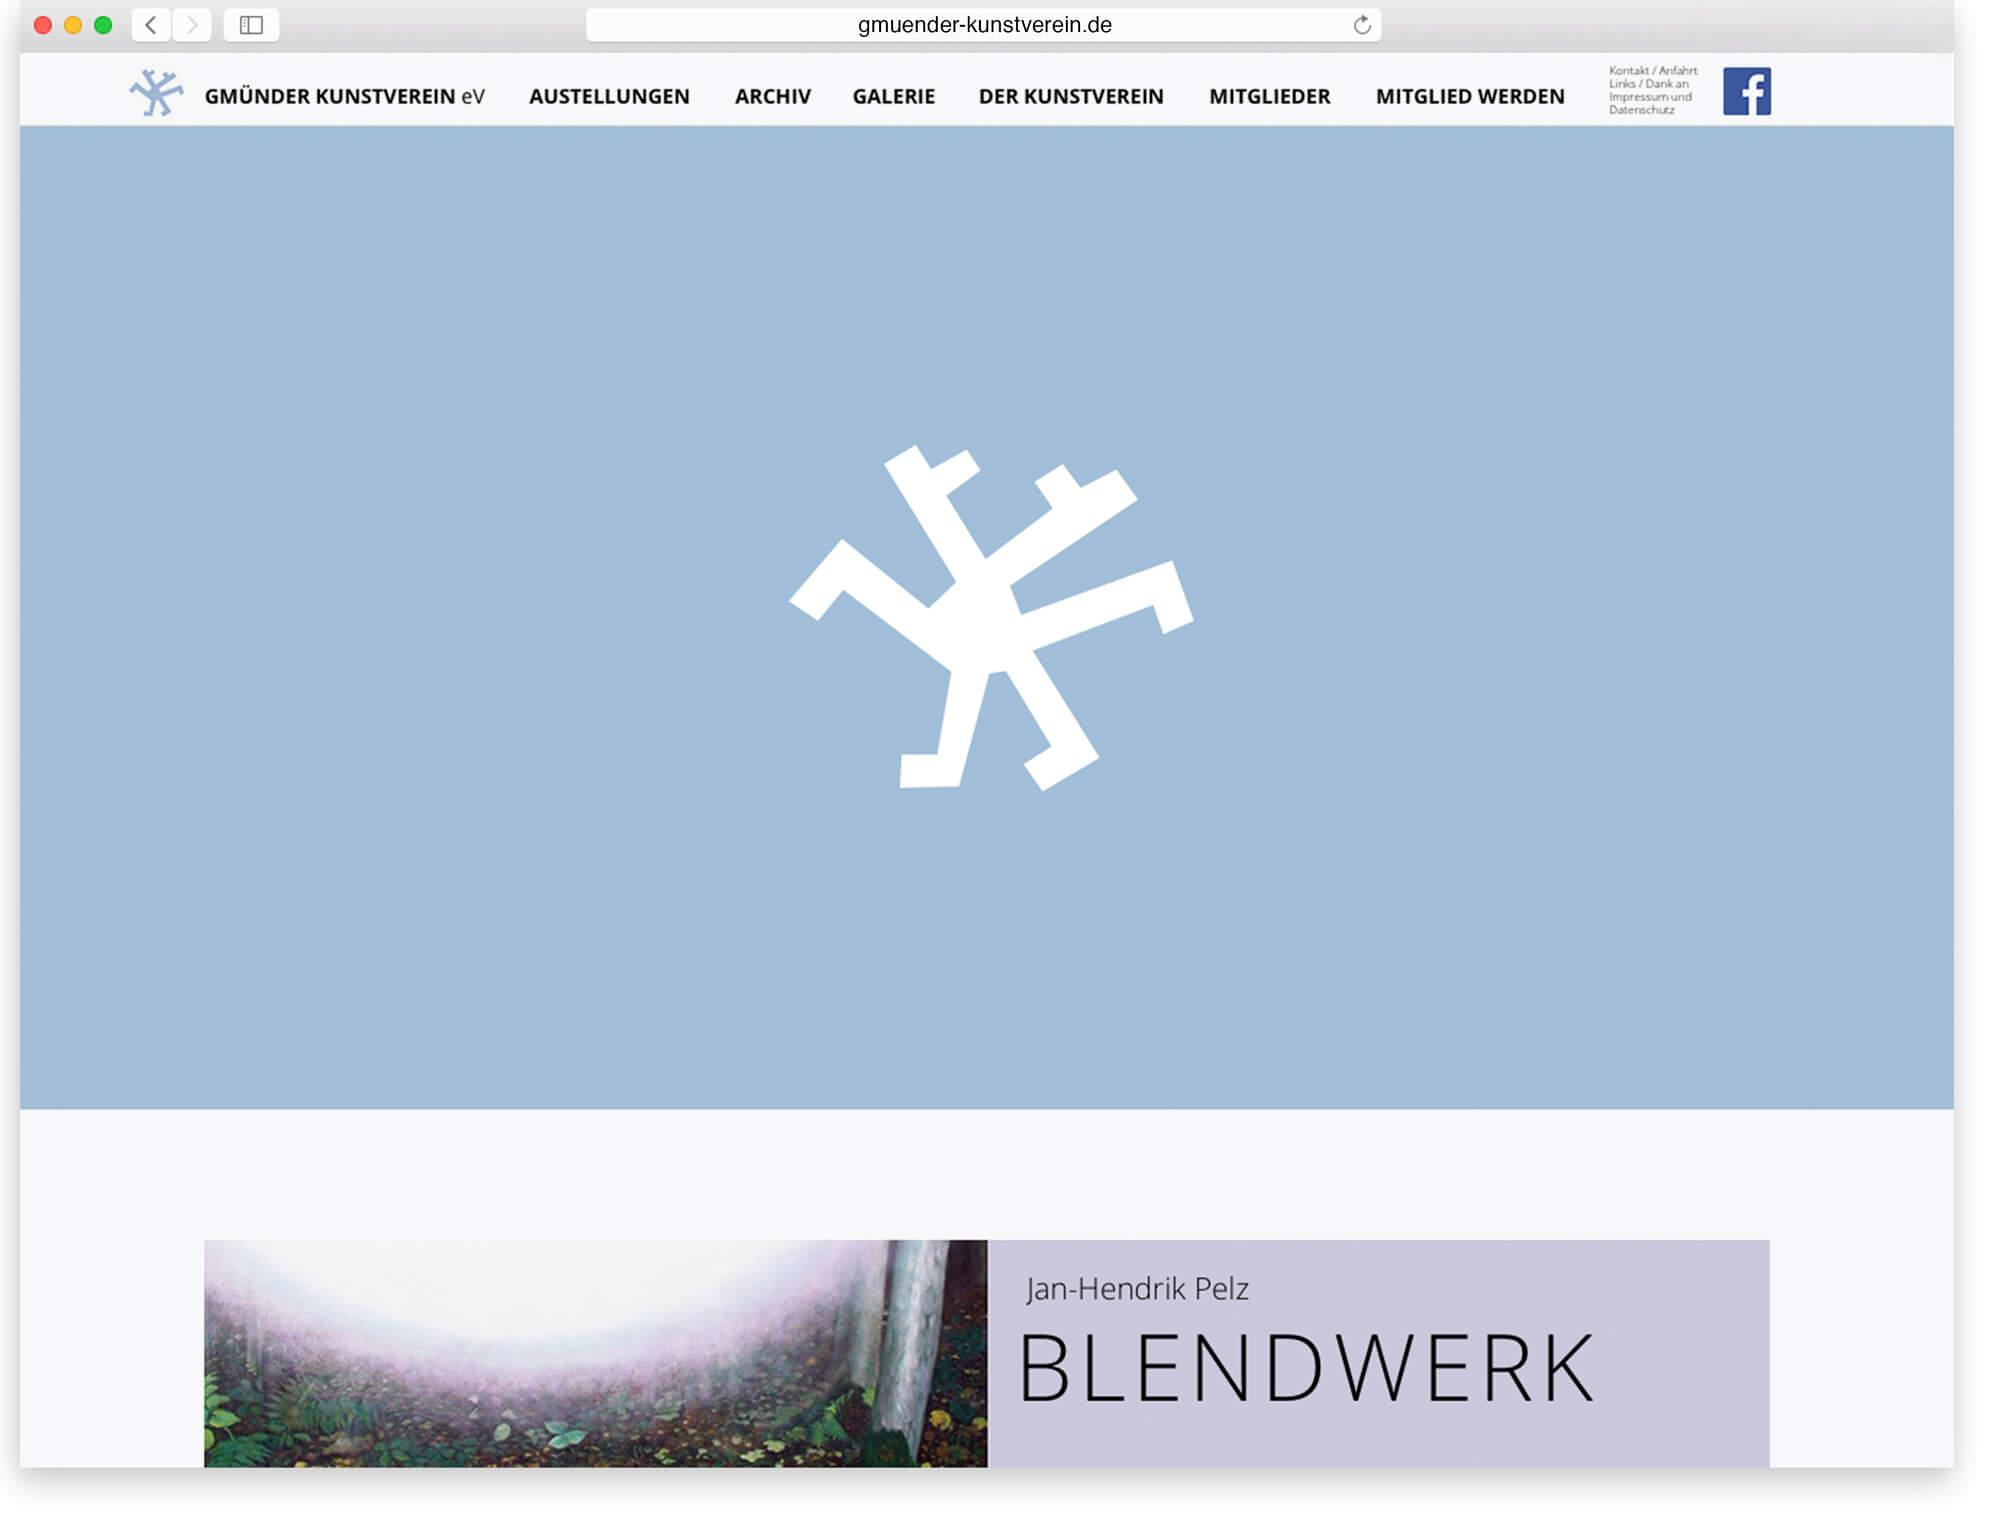 fh-web-kunstverein-website-300.jpg